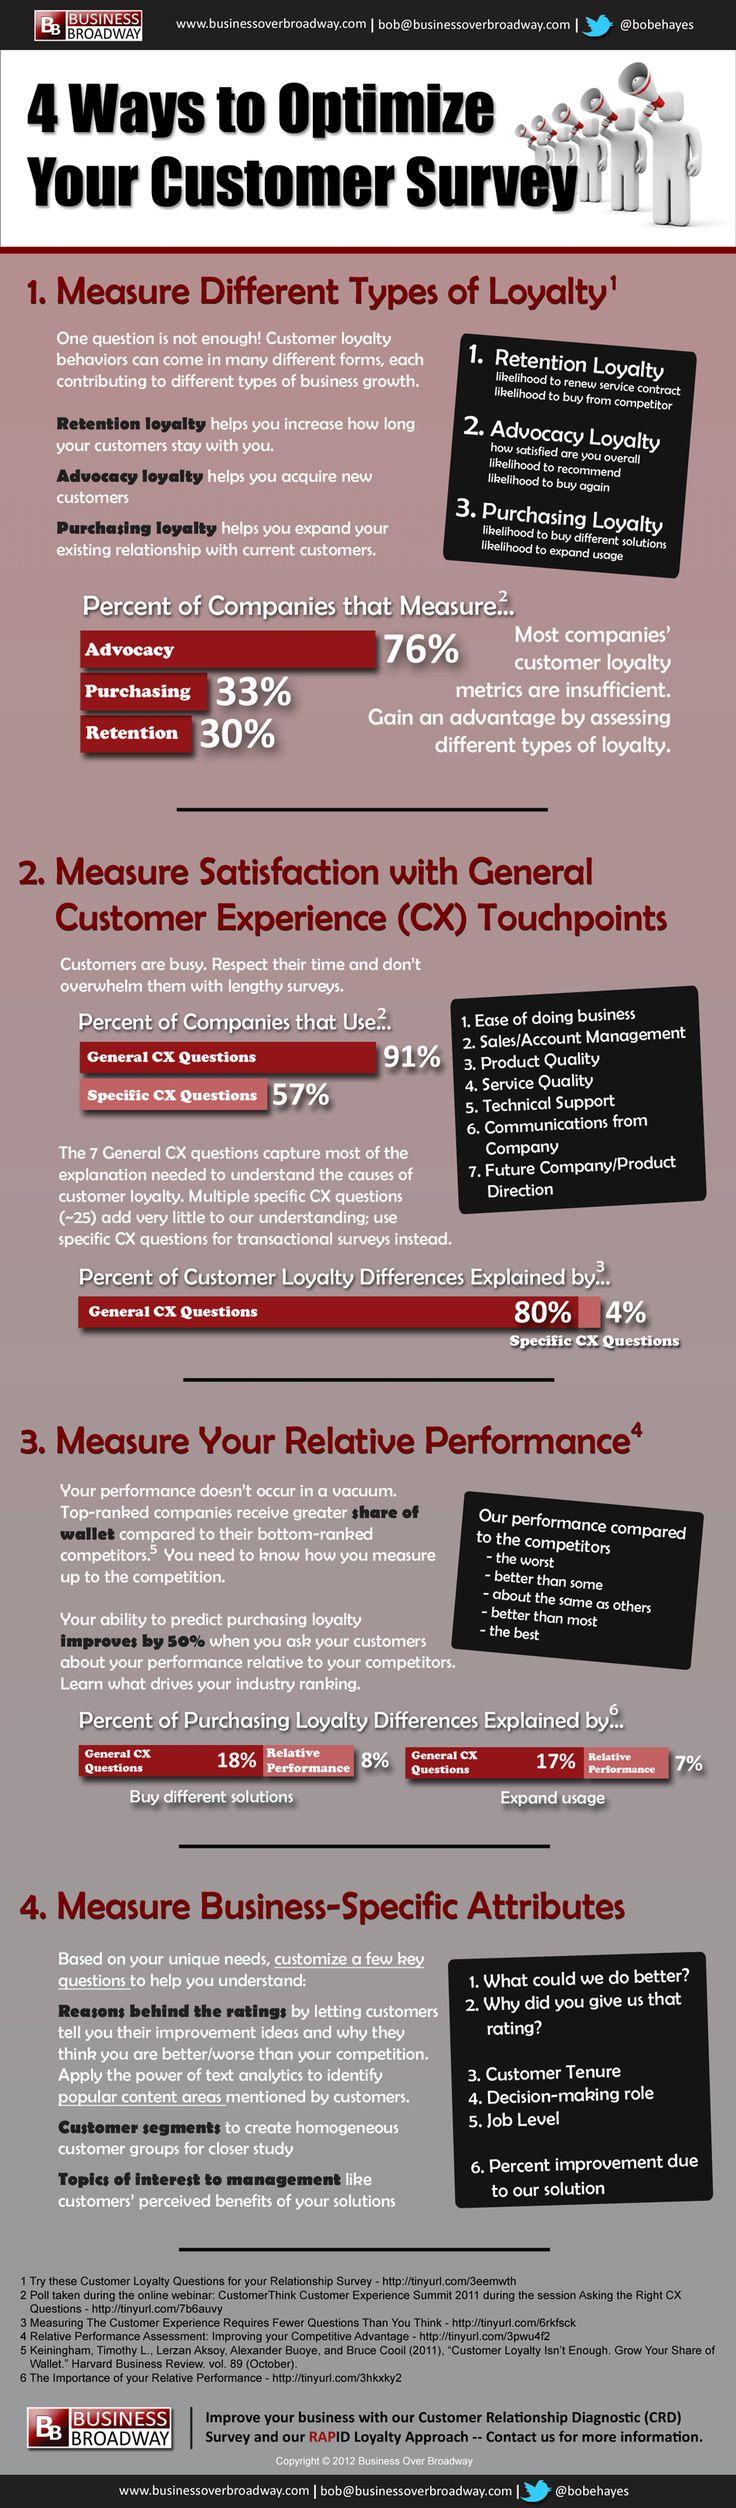 4 Ways to Optimize Your Customer Survey [INFOGRAPHIC]Custom Loyalty, Custom Experiments, Custom Survey,  Website, Social Media, Survey Socialmedia, Custom Service, Business Infographic, Custom Satisfaction